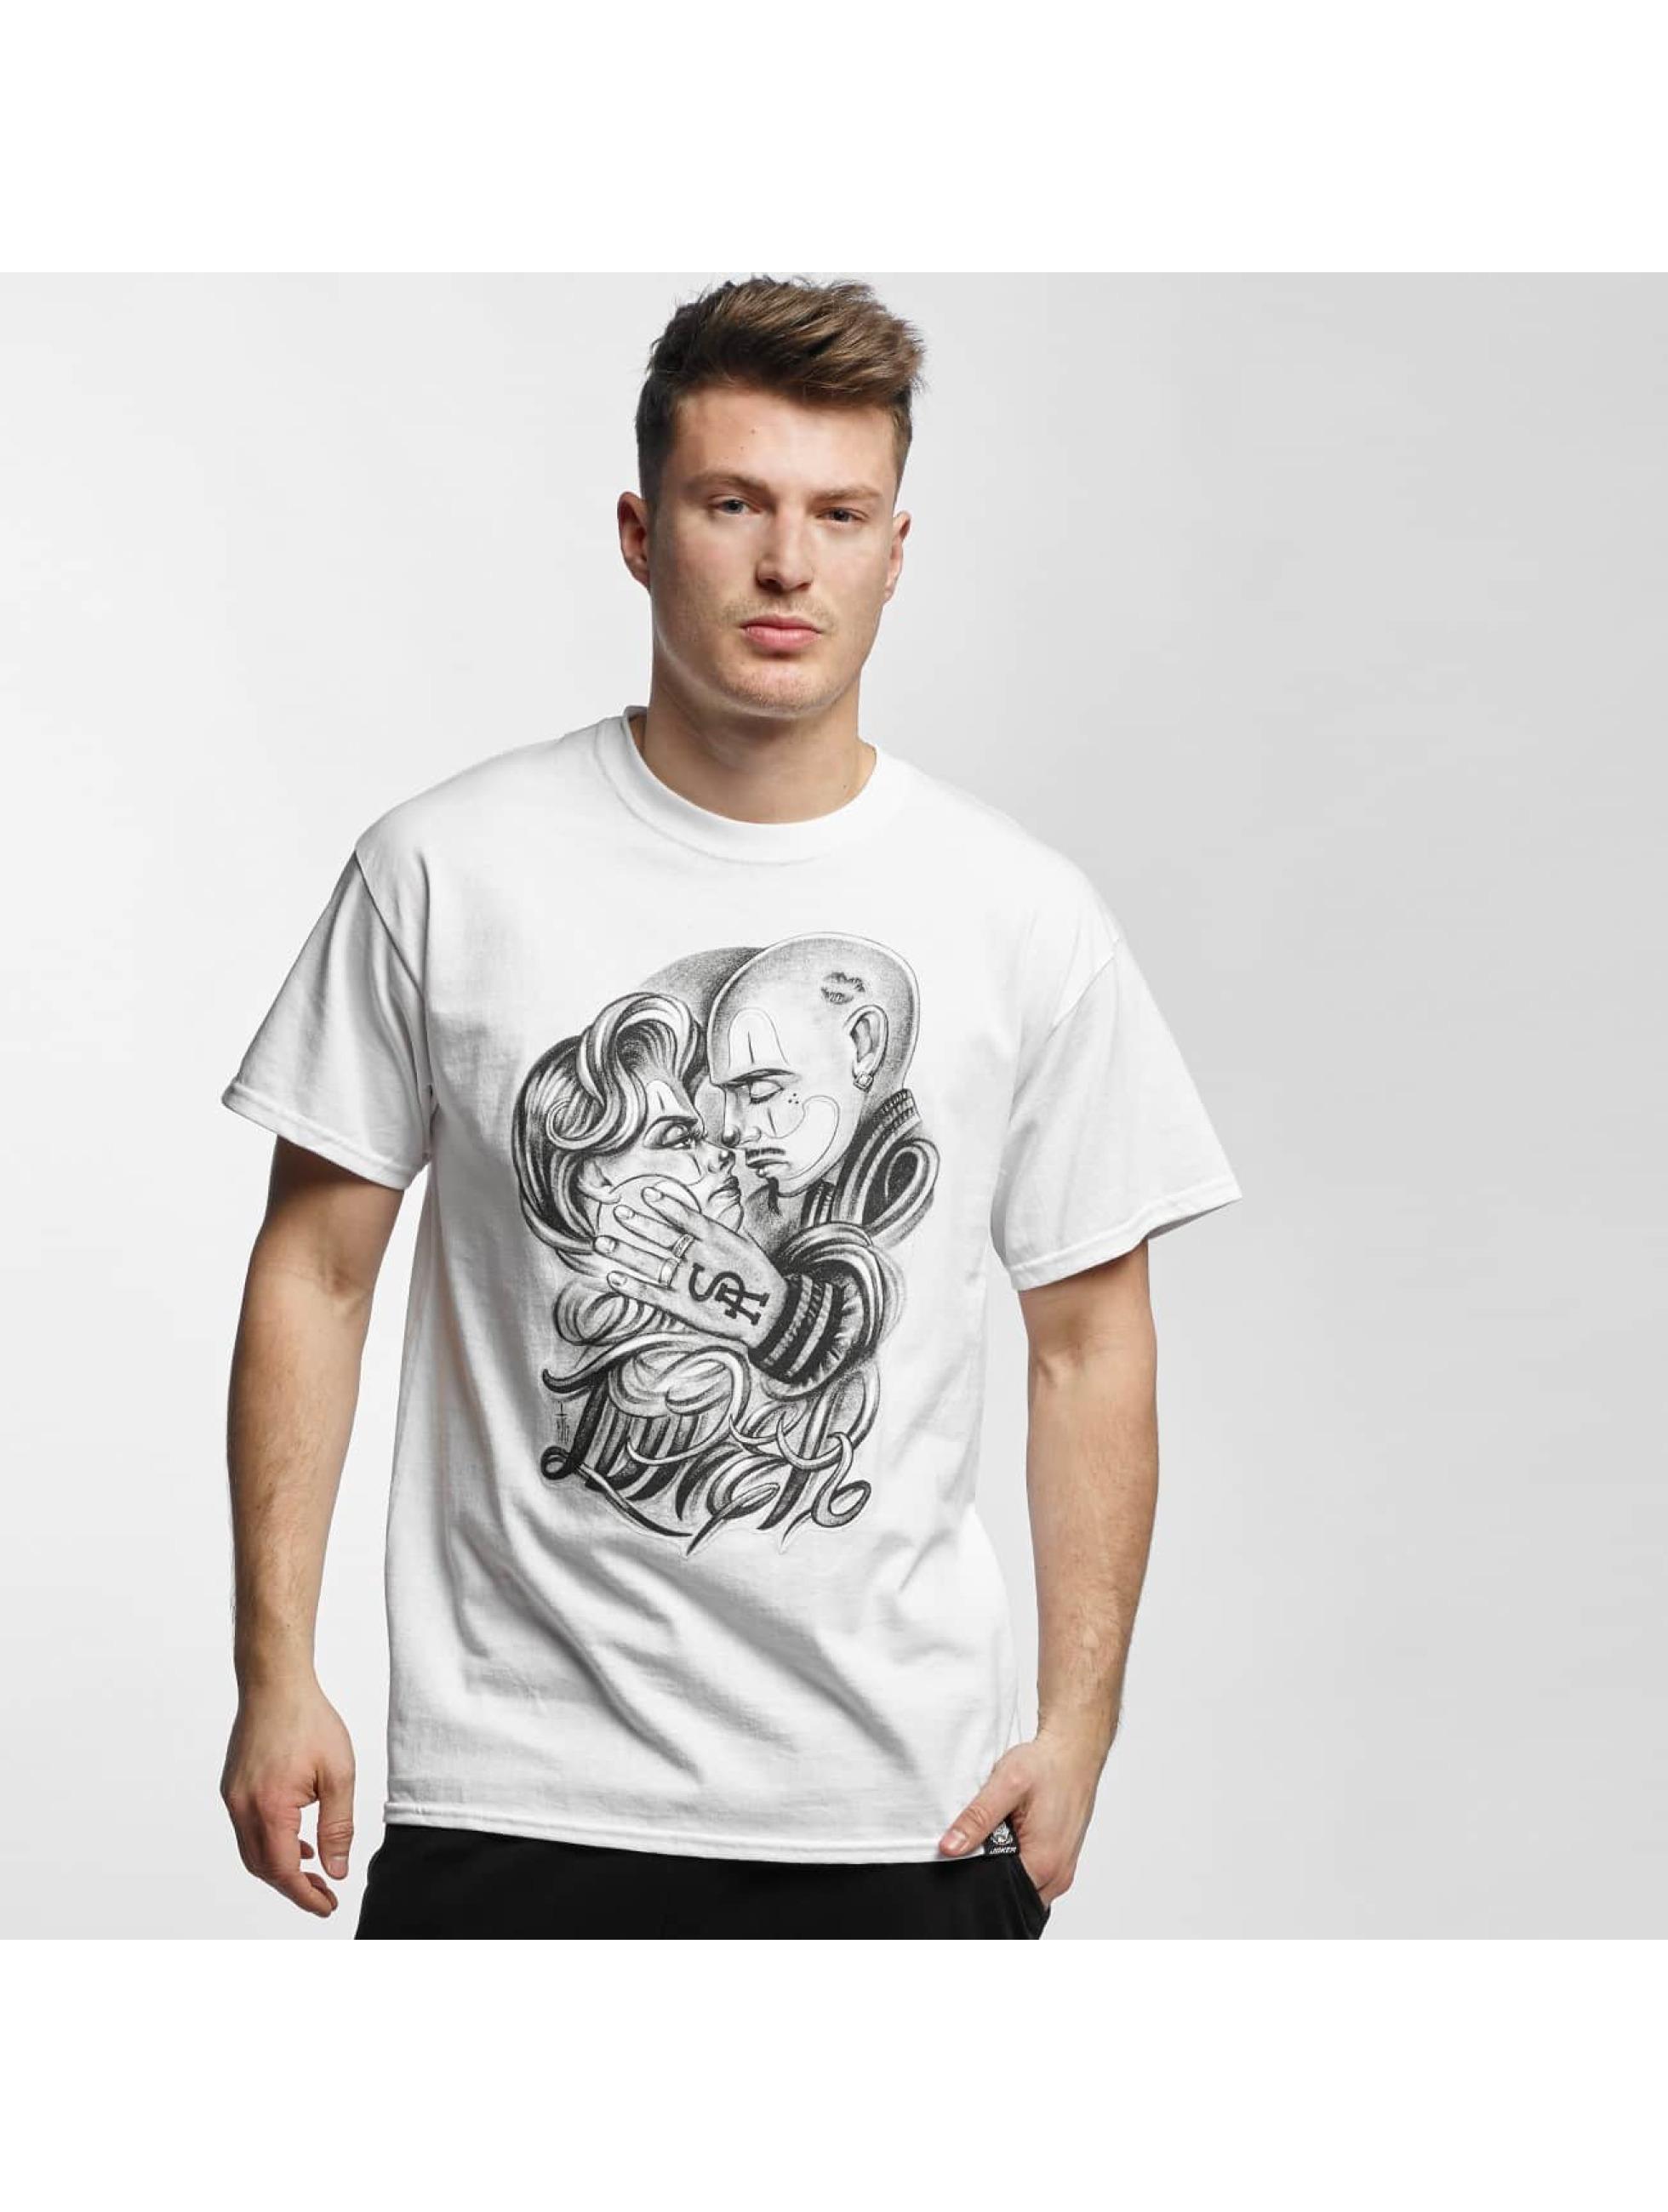 Joker-Uomini-Maglieria-T-shirt-Love